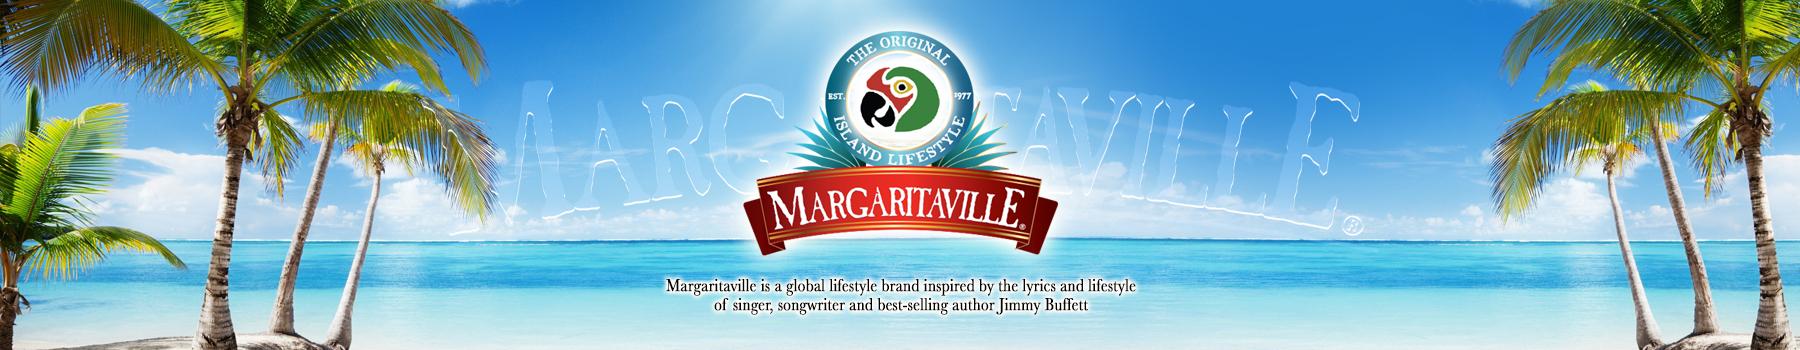 Margaritaville BannerNEW